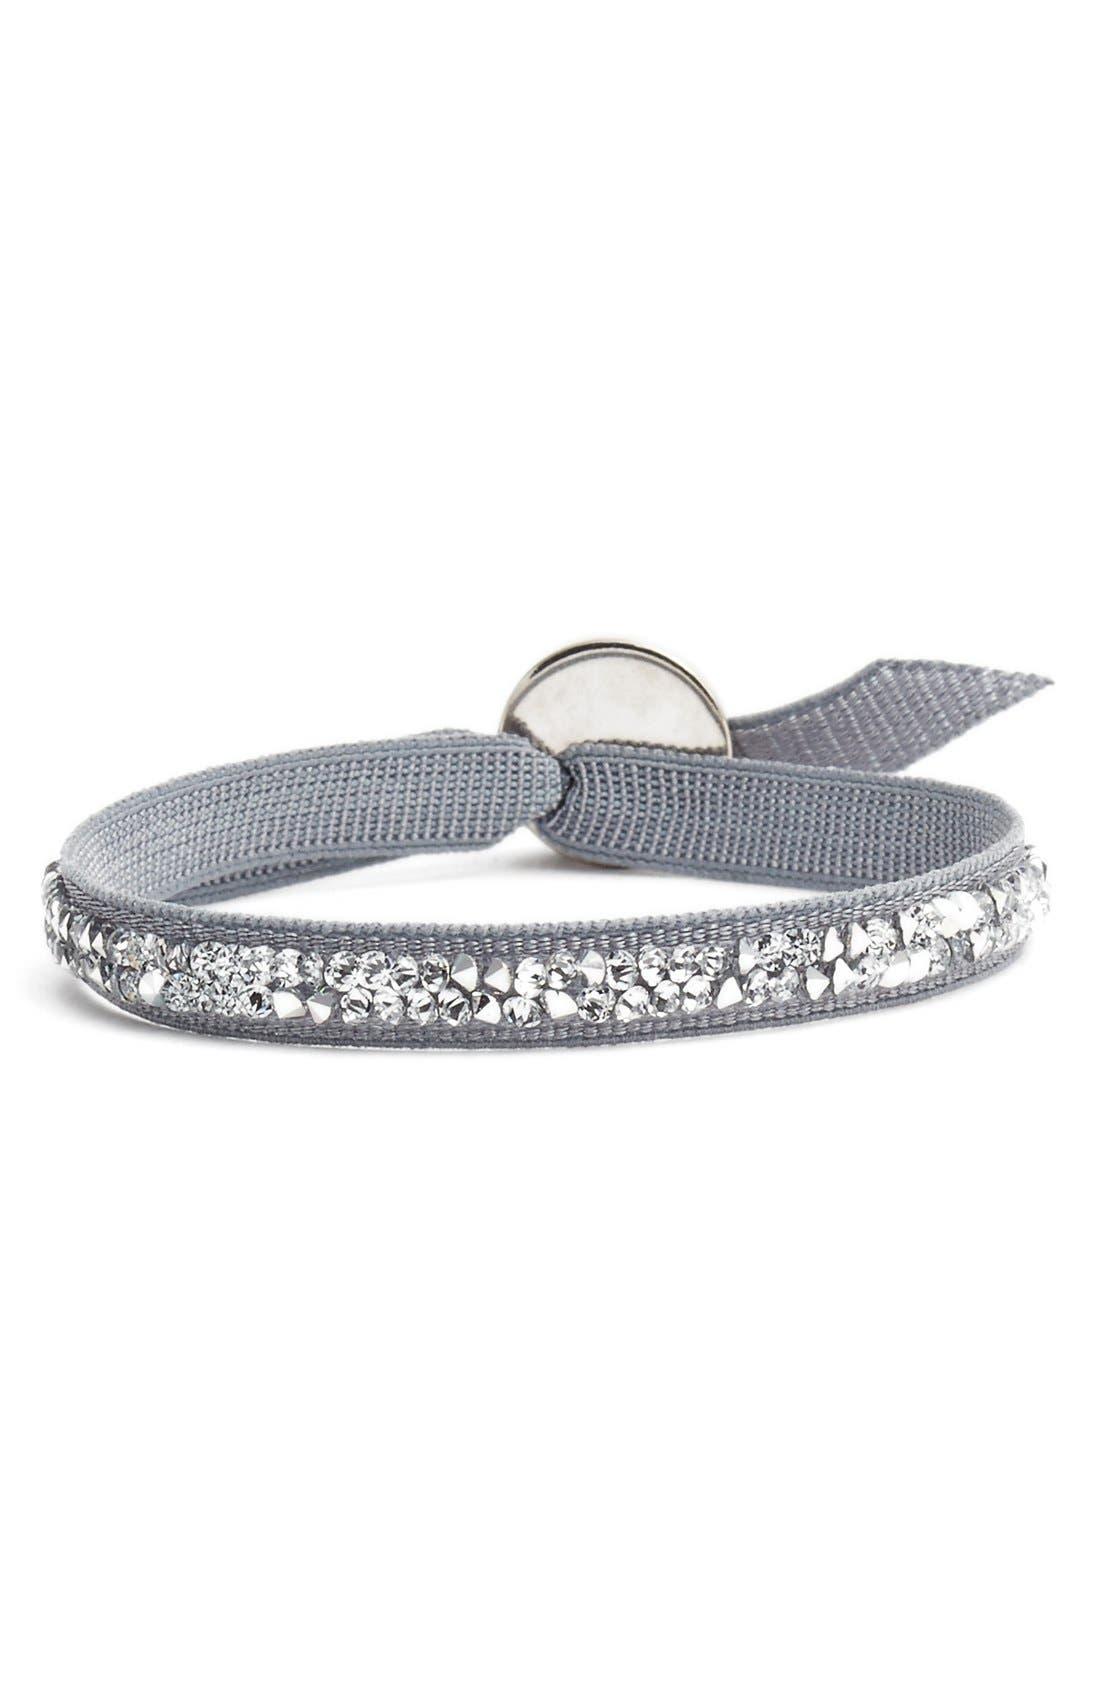 Alternate Image 1 Selected - The Paris Bracelet 'Fine Rocks' Bracelet